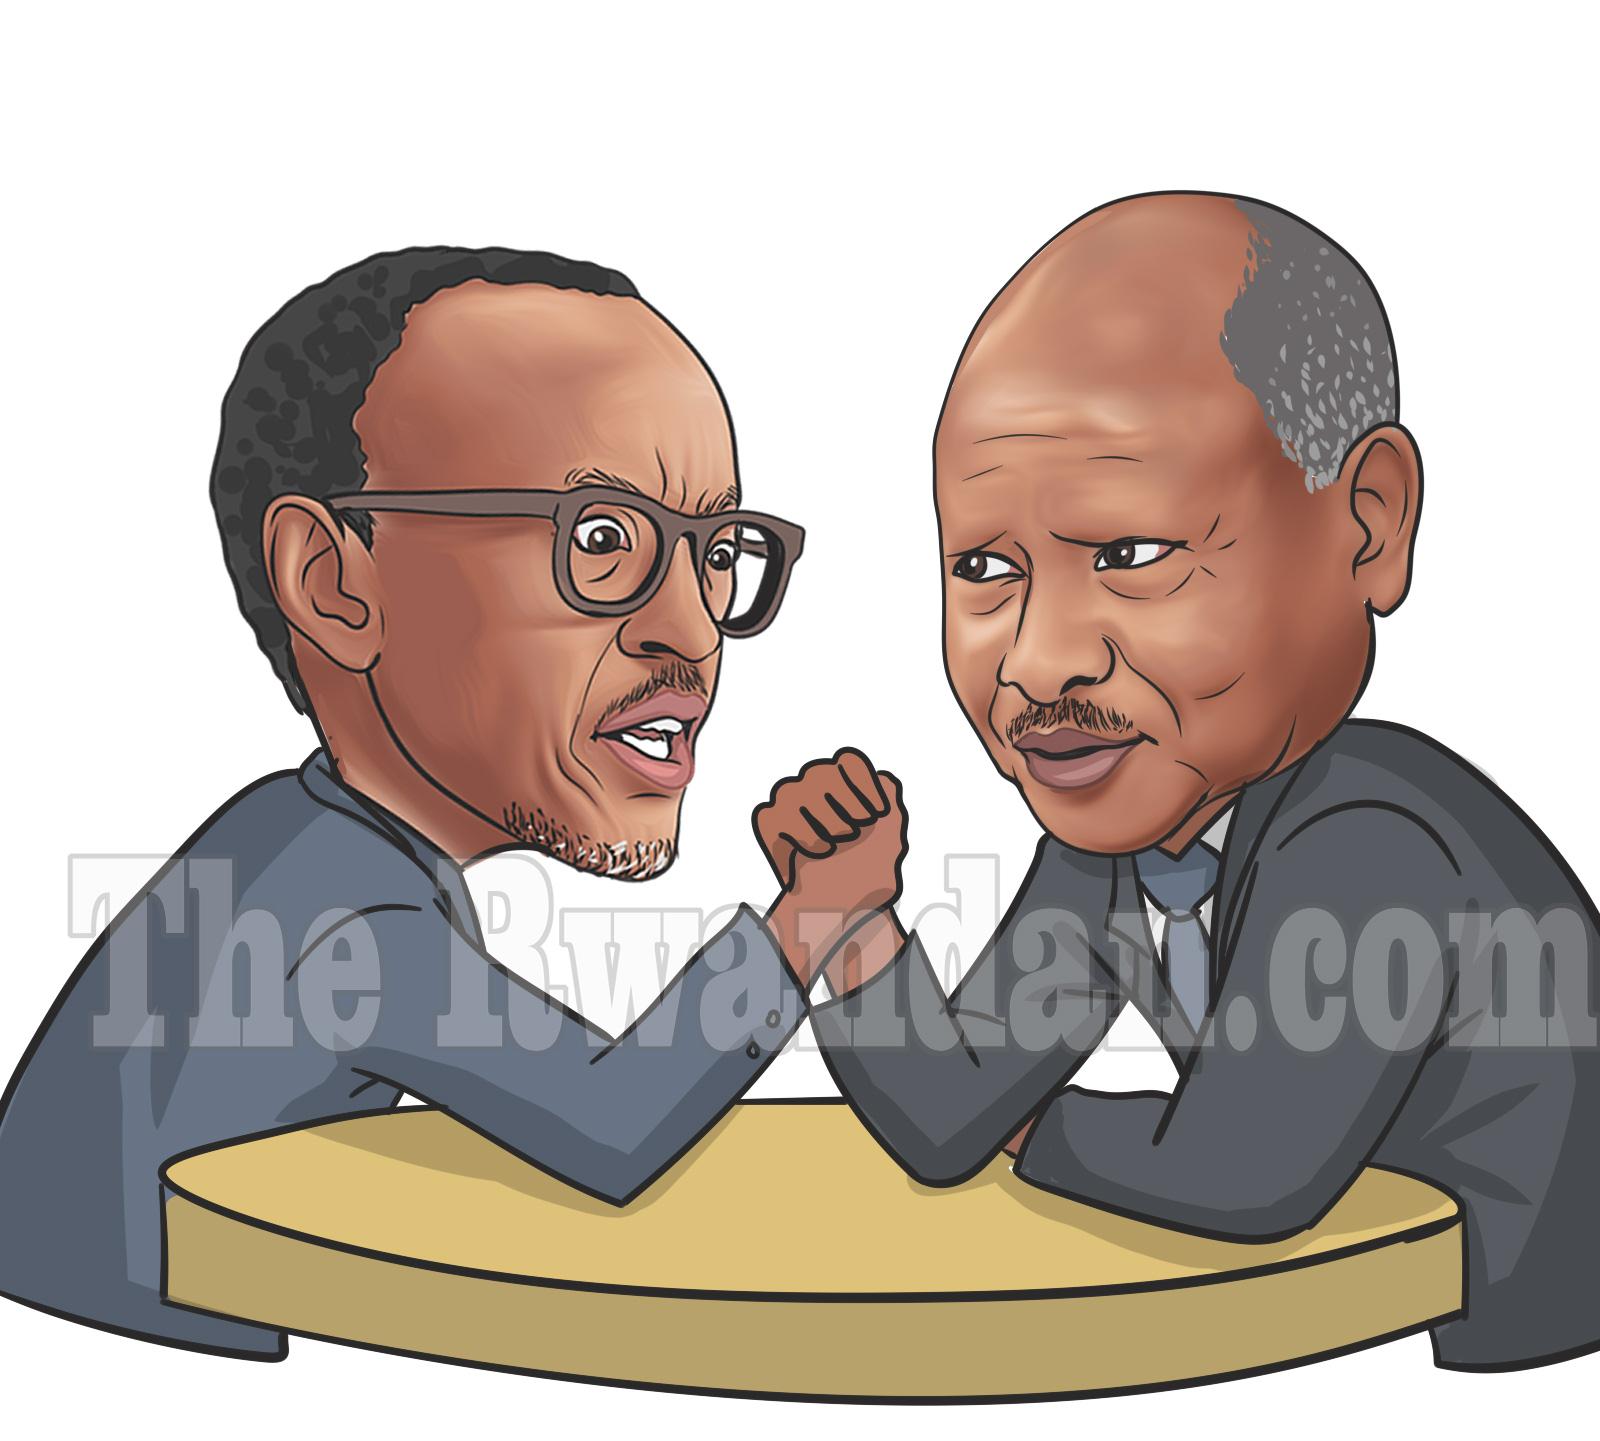 Who can win between Uganda and Rwanda at war?   Therwandan